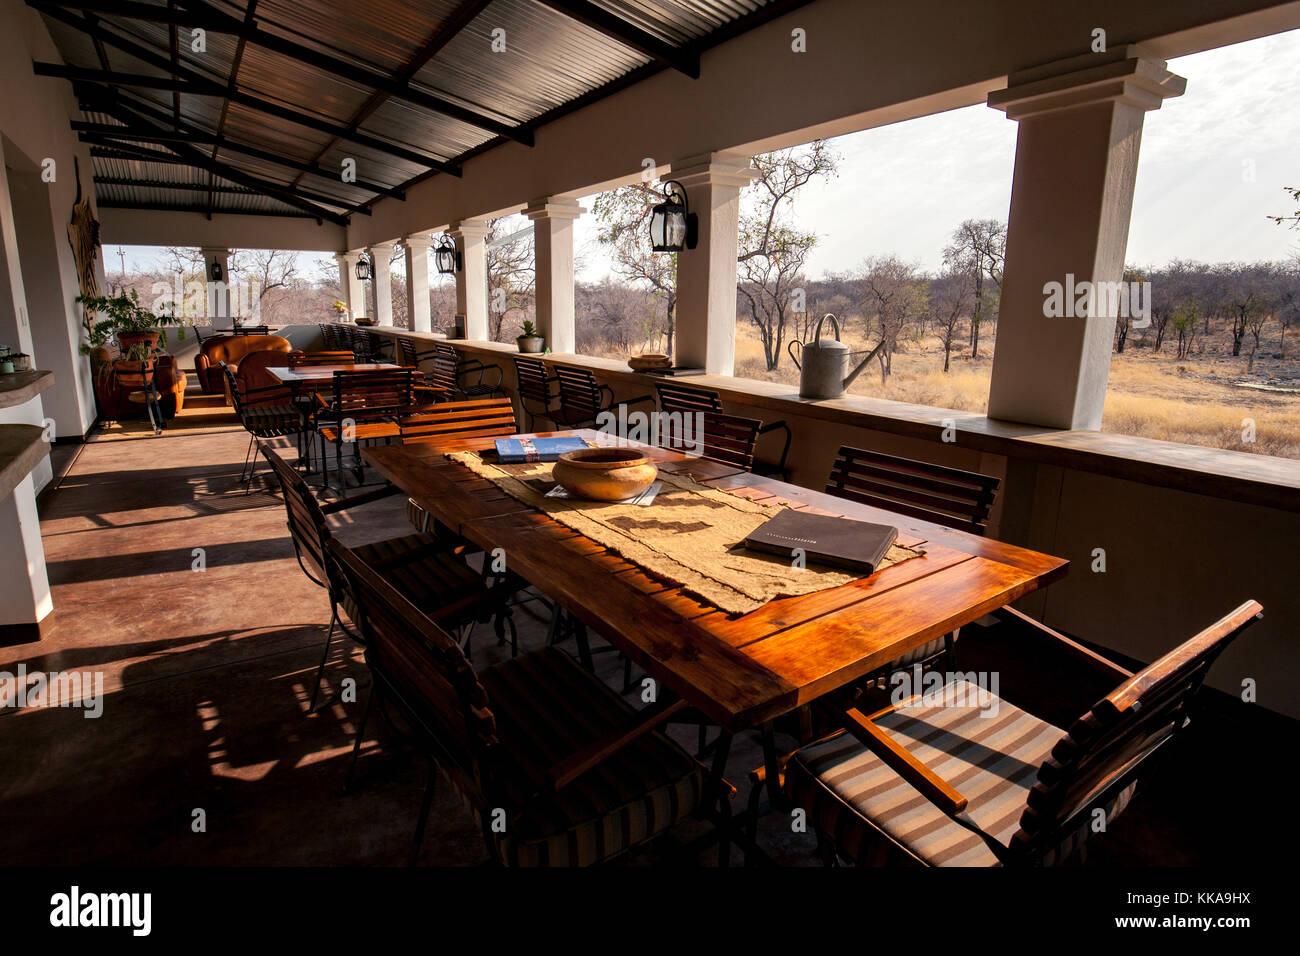 Restaurant Bereich tamboti Luxus Campingplatz, onguma Game Reserve, Namibia, Afrika Stockfoto